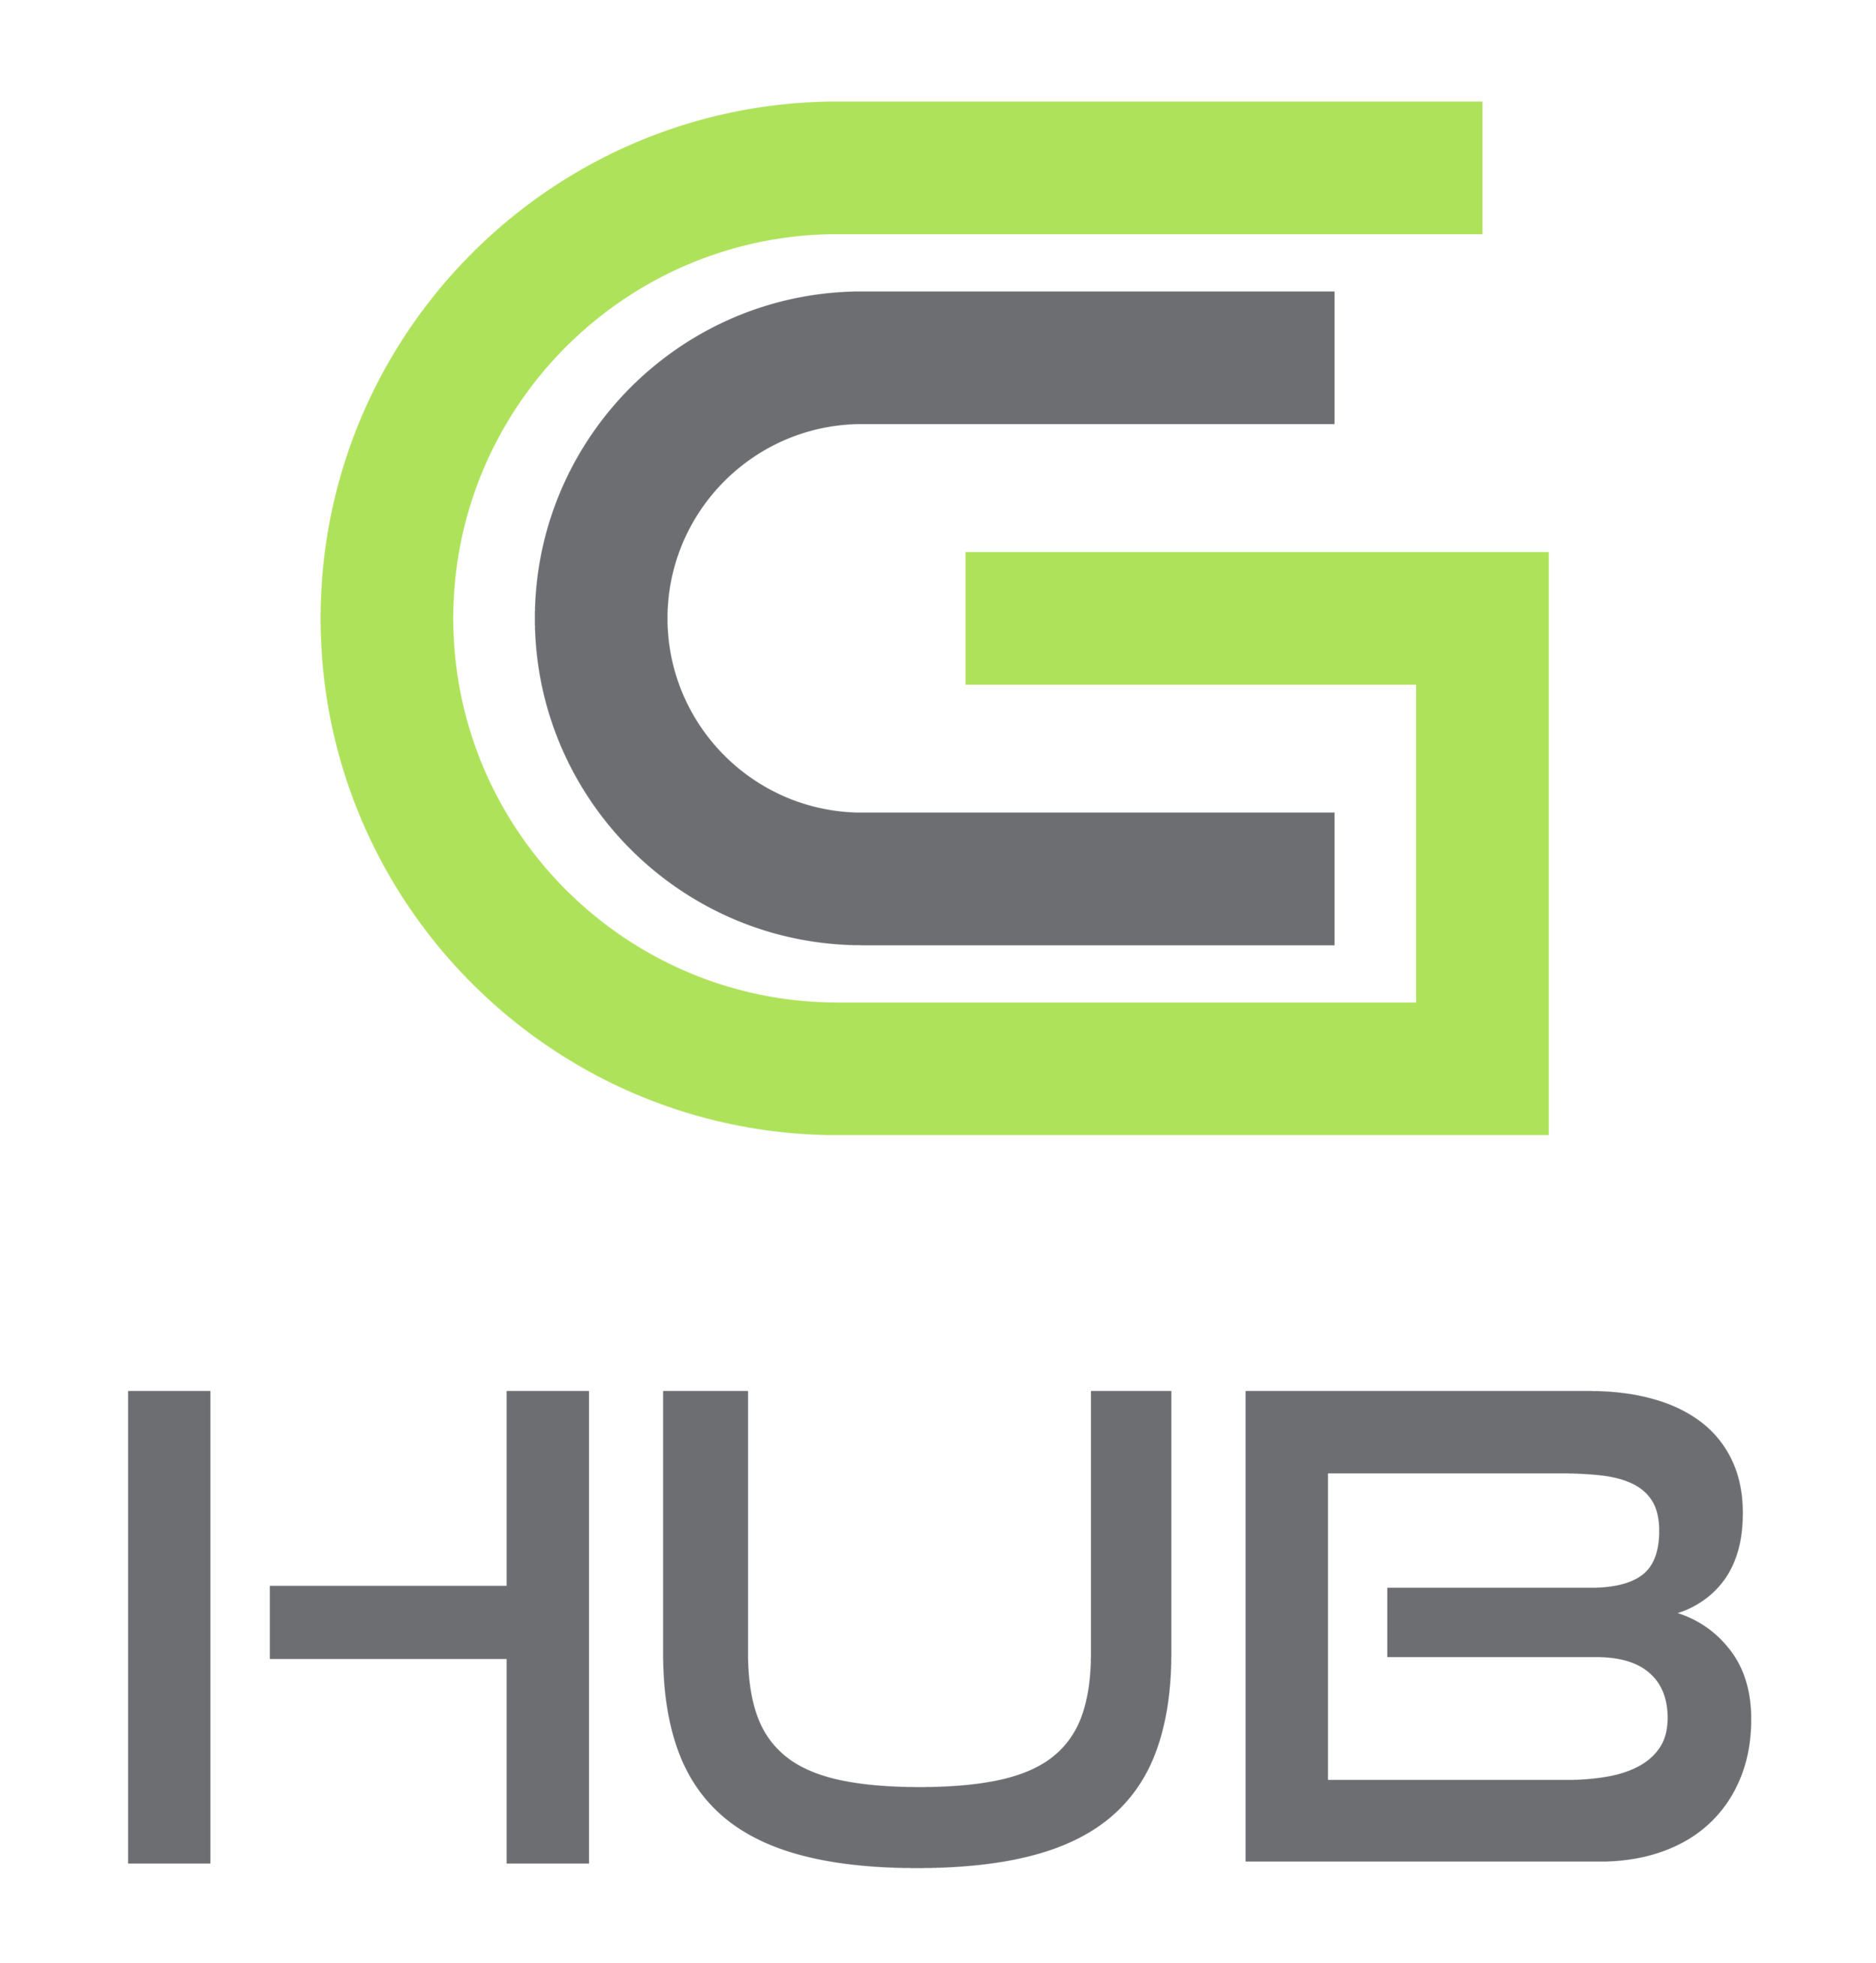 gchub logo-green-greyai-01.png